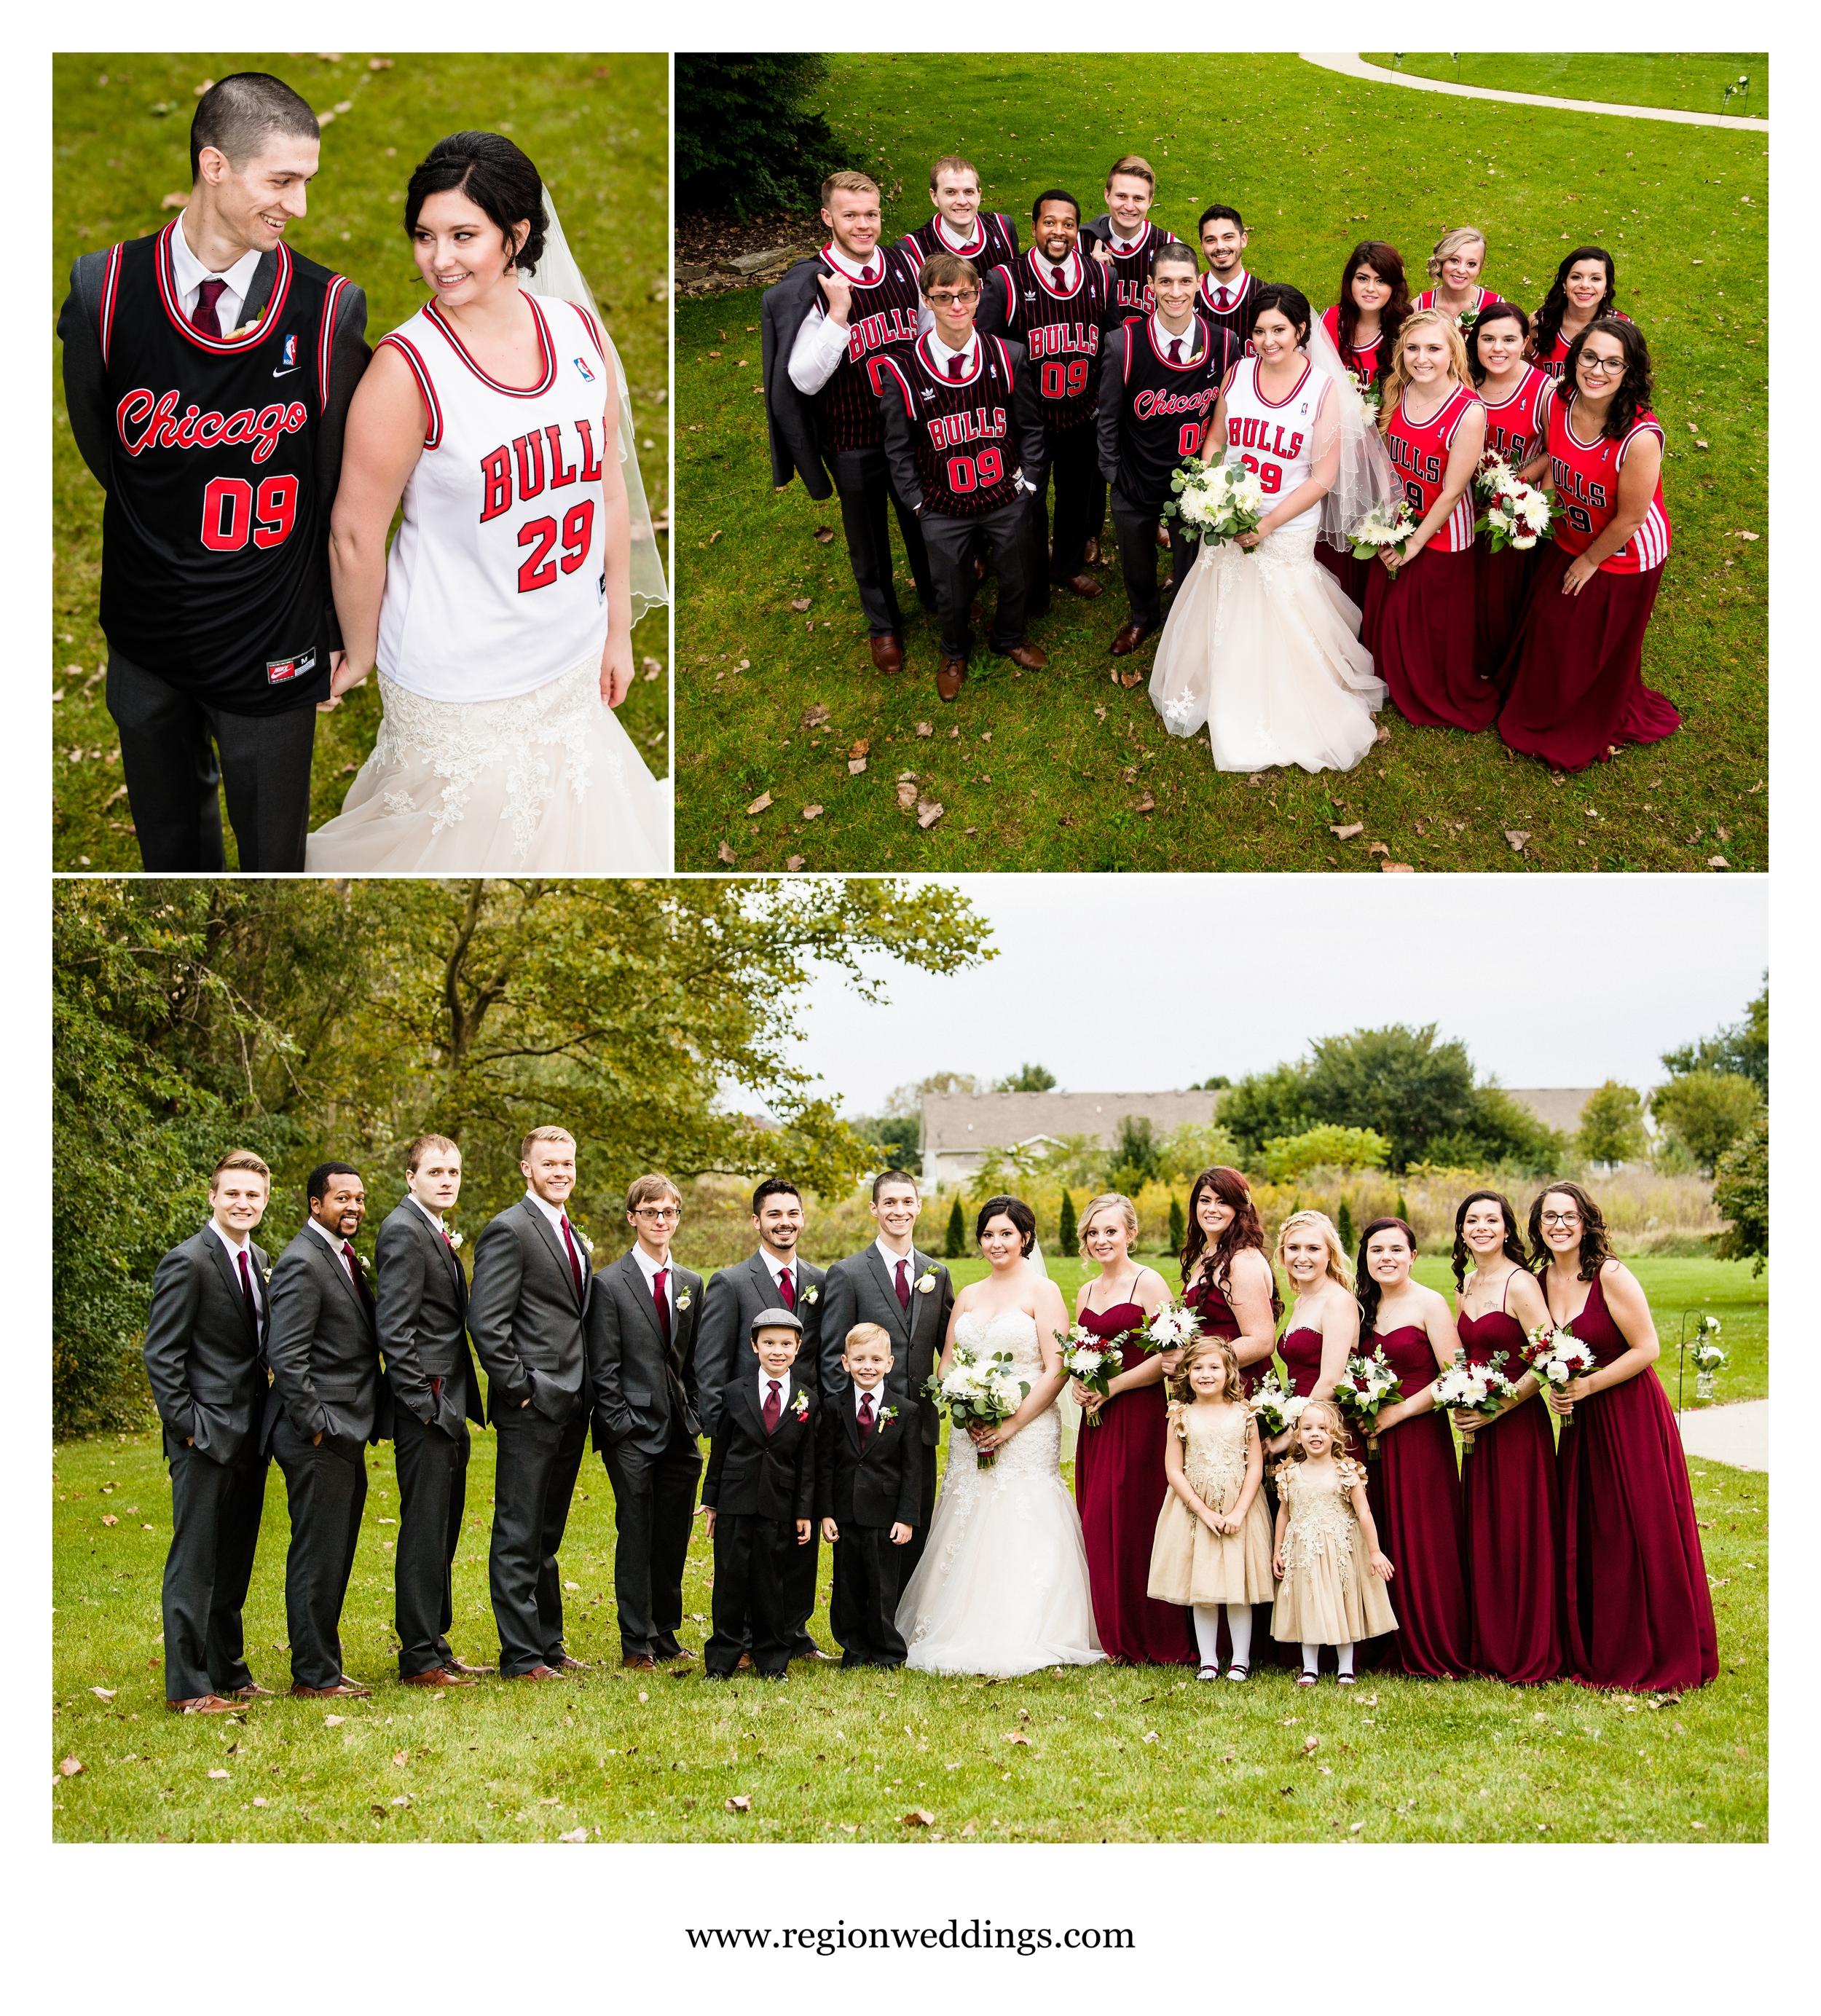 Chicago Bulls themed wedding photos.